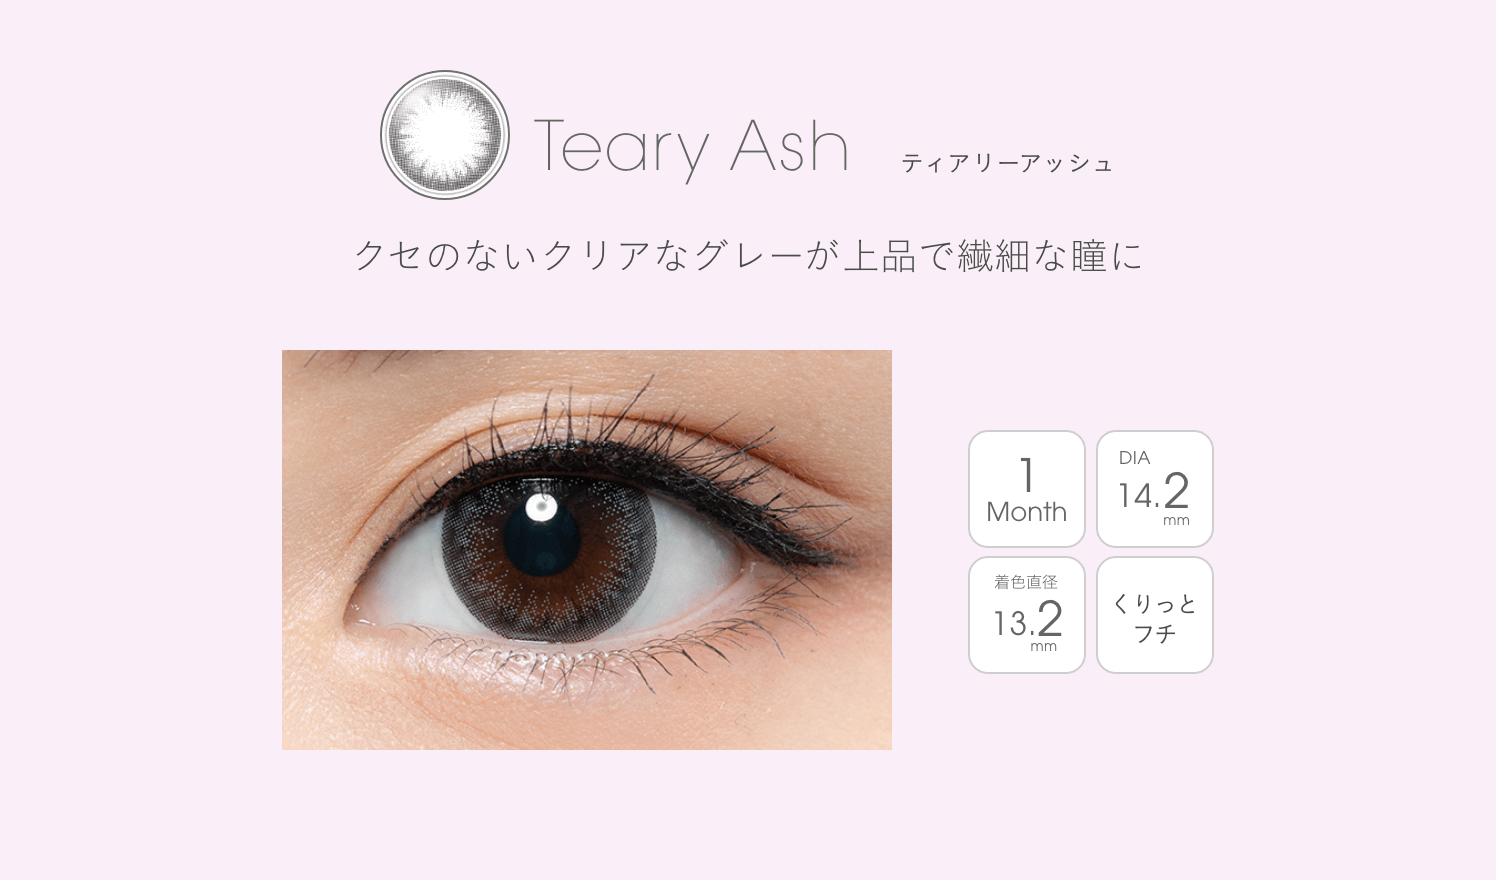 Teary Ash